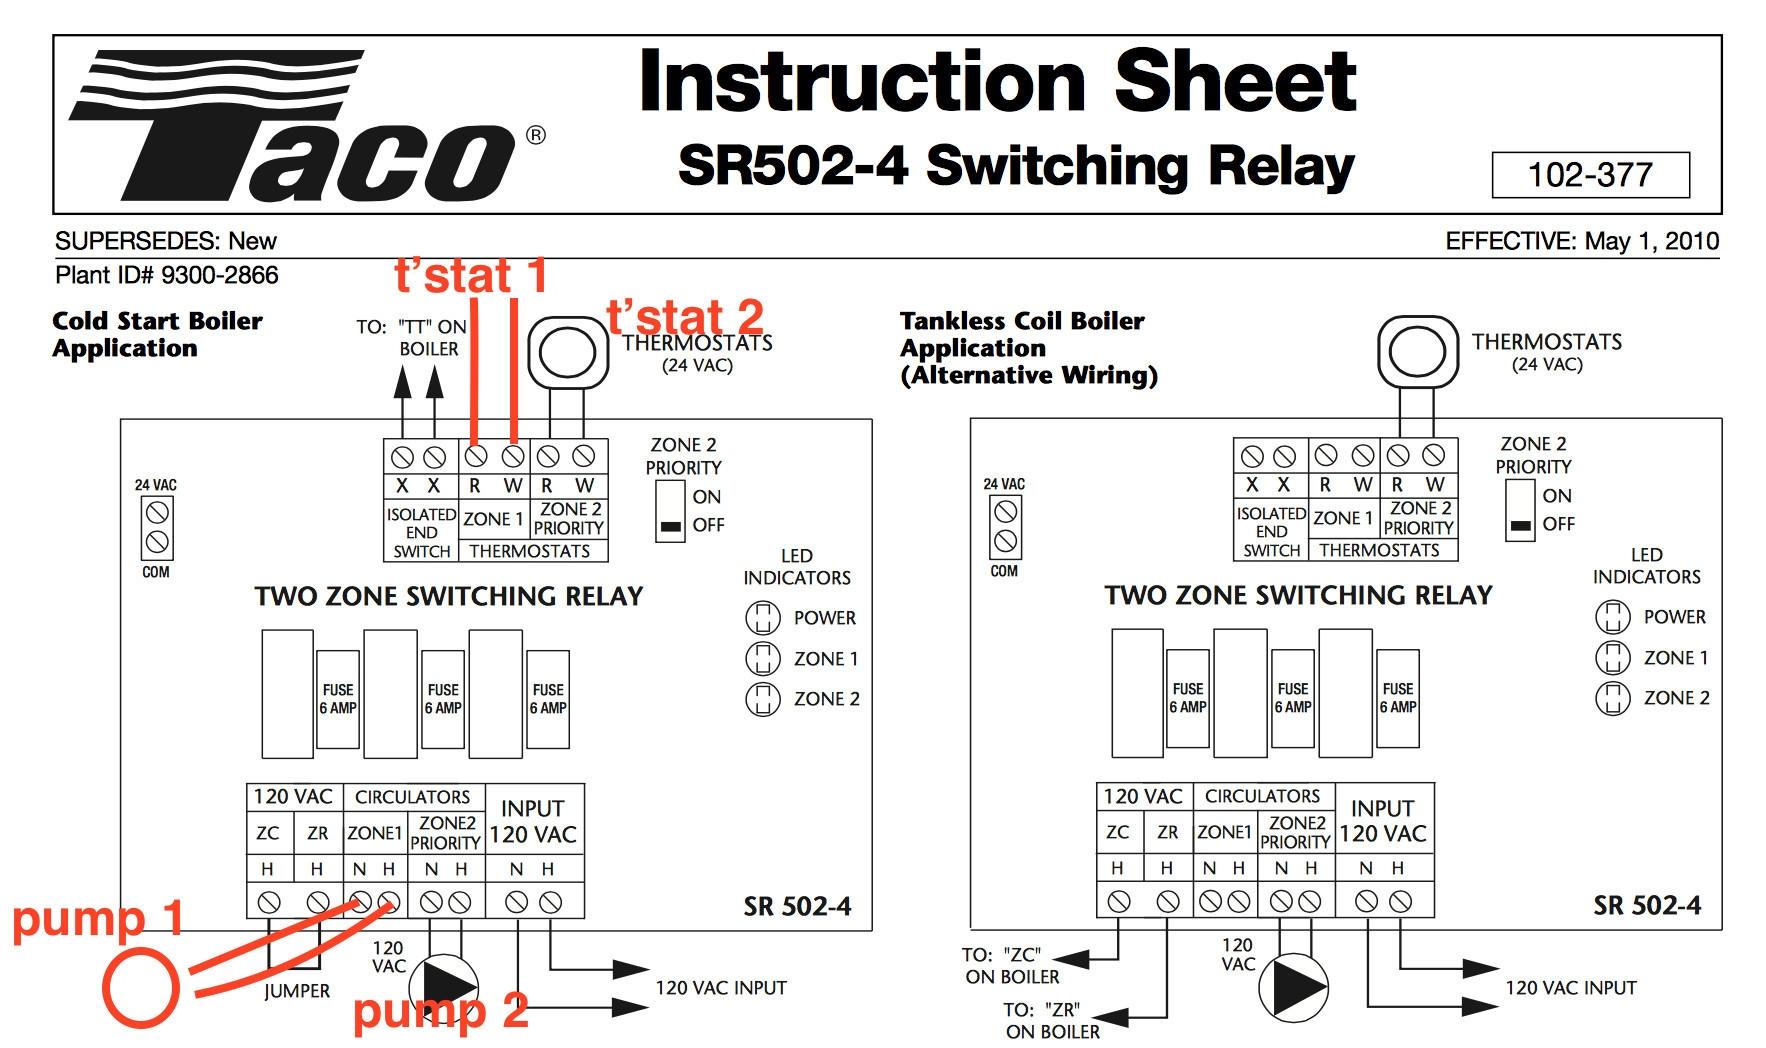 taco valve to boiler wiring schematic manual e books Burnam Steam Boiler Wiring Schematic taco 007 f5 wiring diagram schematic diagramtaco circulator wiring 007 f4 wiring diagram burnham boiler wiring